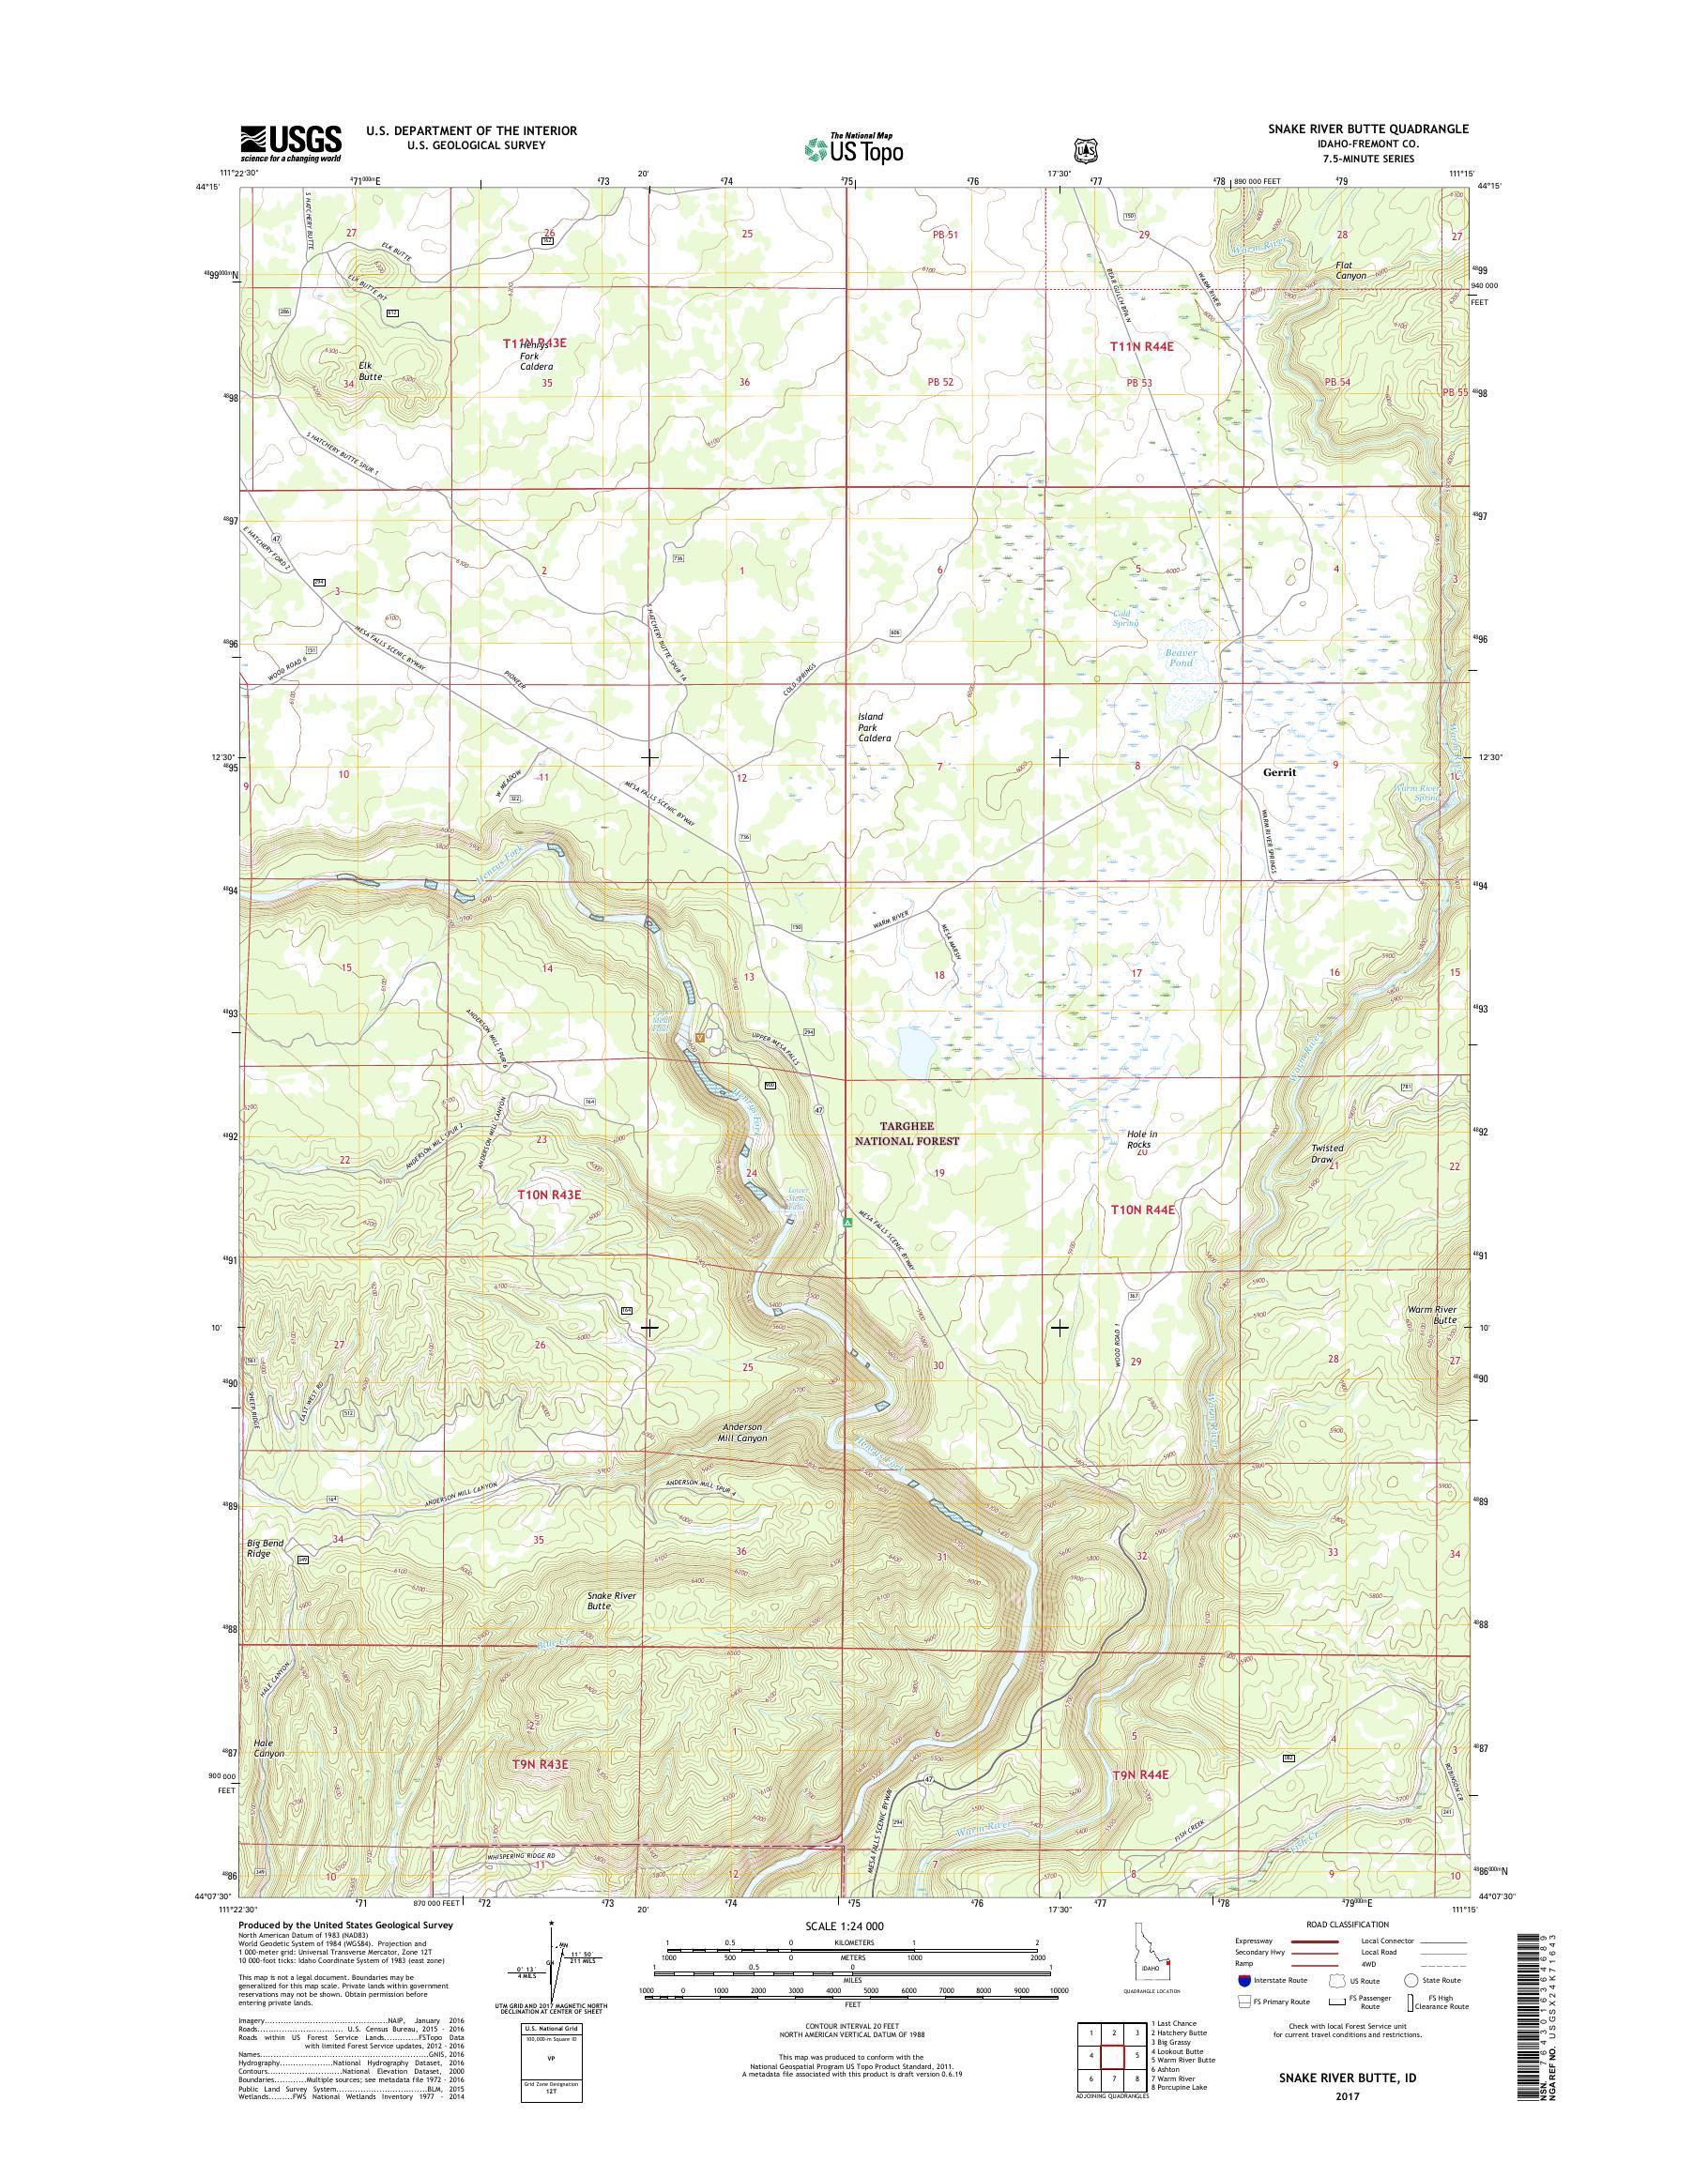 Mytopo Snake River Butte Idaho Usgs Quad Topo Map - Us-map-snake-river